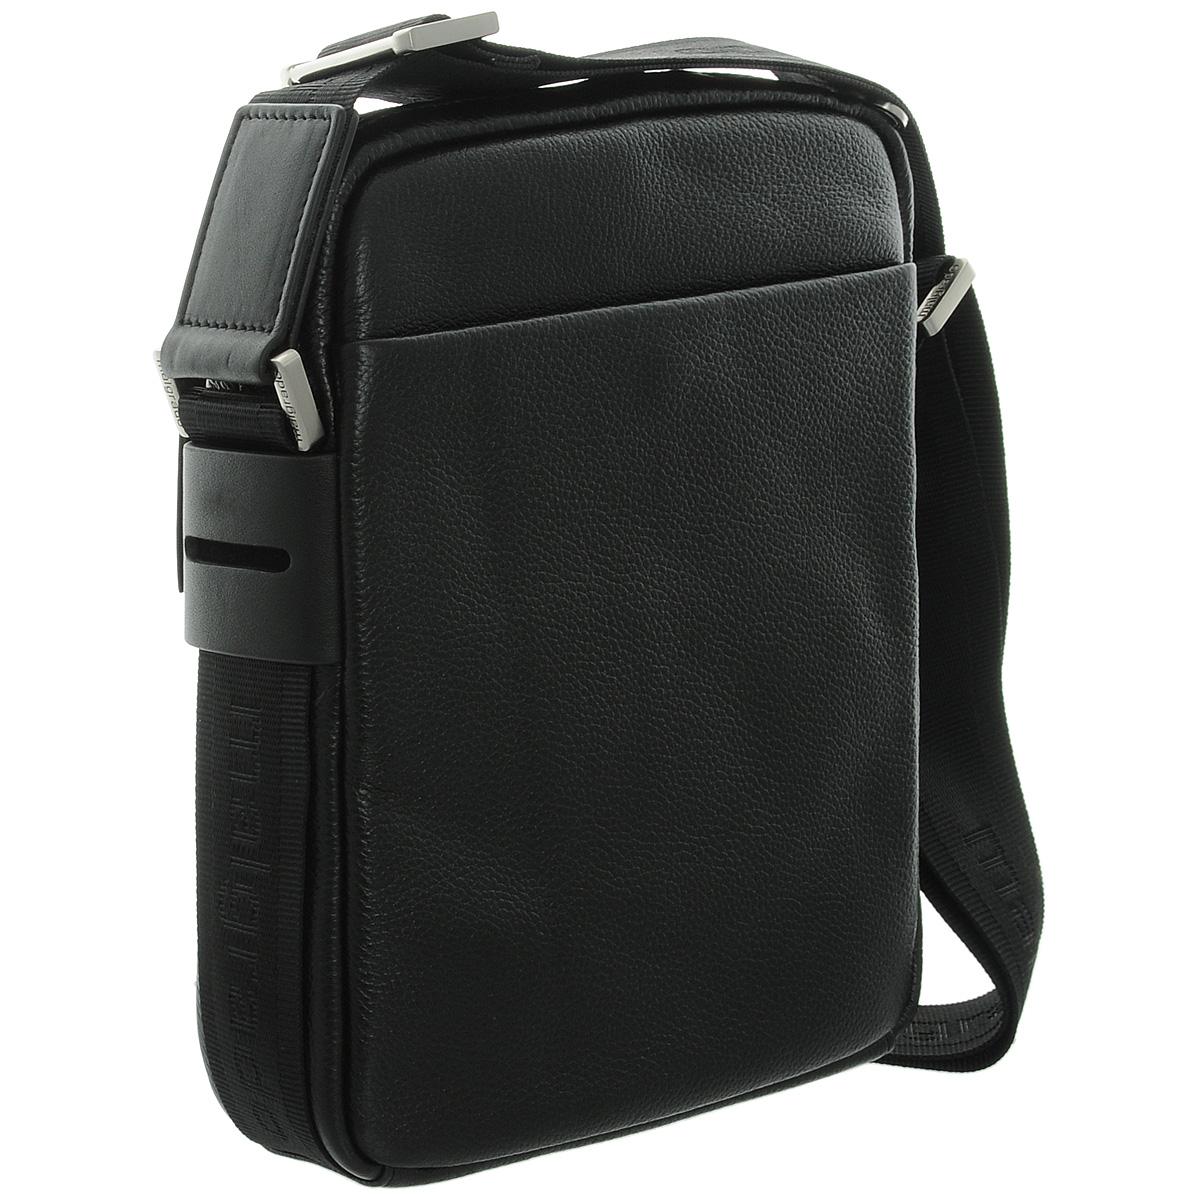 Сумка мужская Malgrado, цвет: черный. BR12-412C1856 ( BR12-412C1856 black сумка мужская Malgrado )